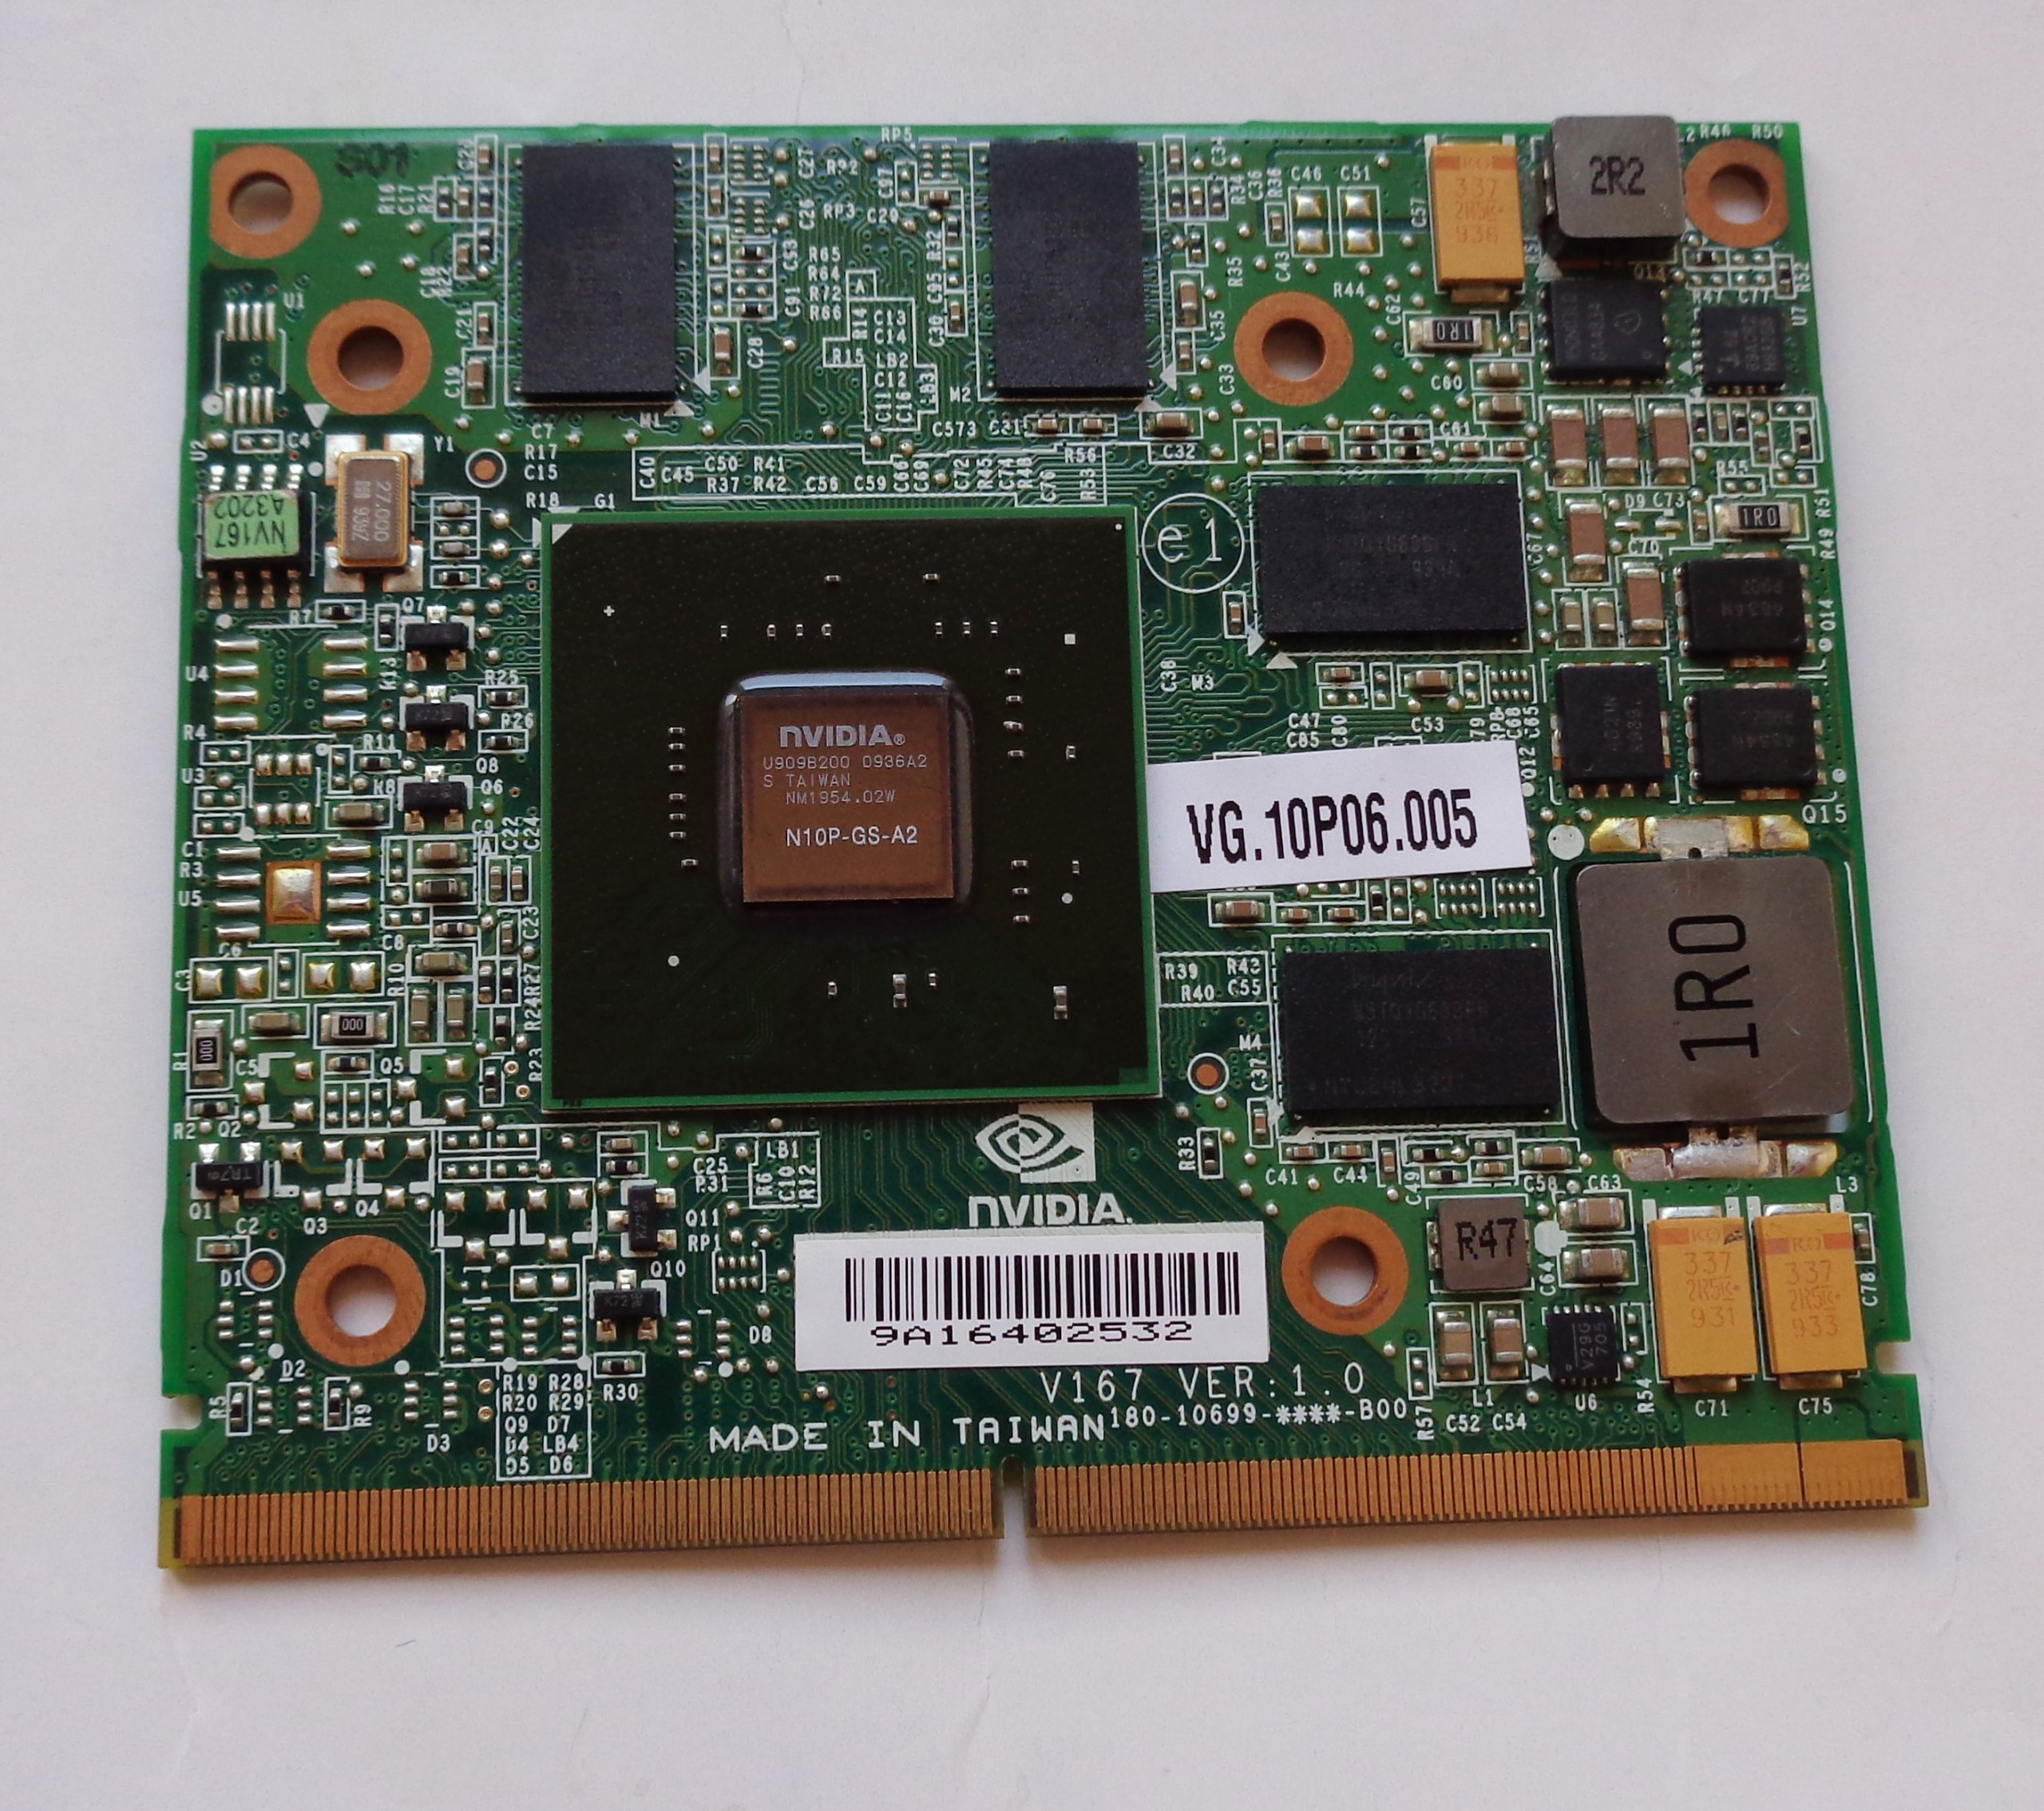 Karta Graficzna Acer Aspire 5739g Nvidia Gt240m 1g 7197907098